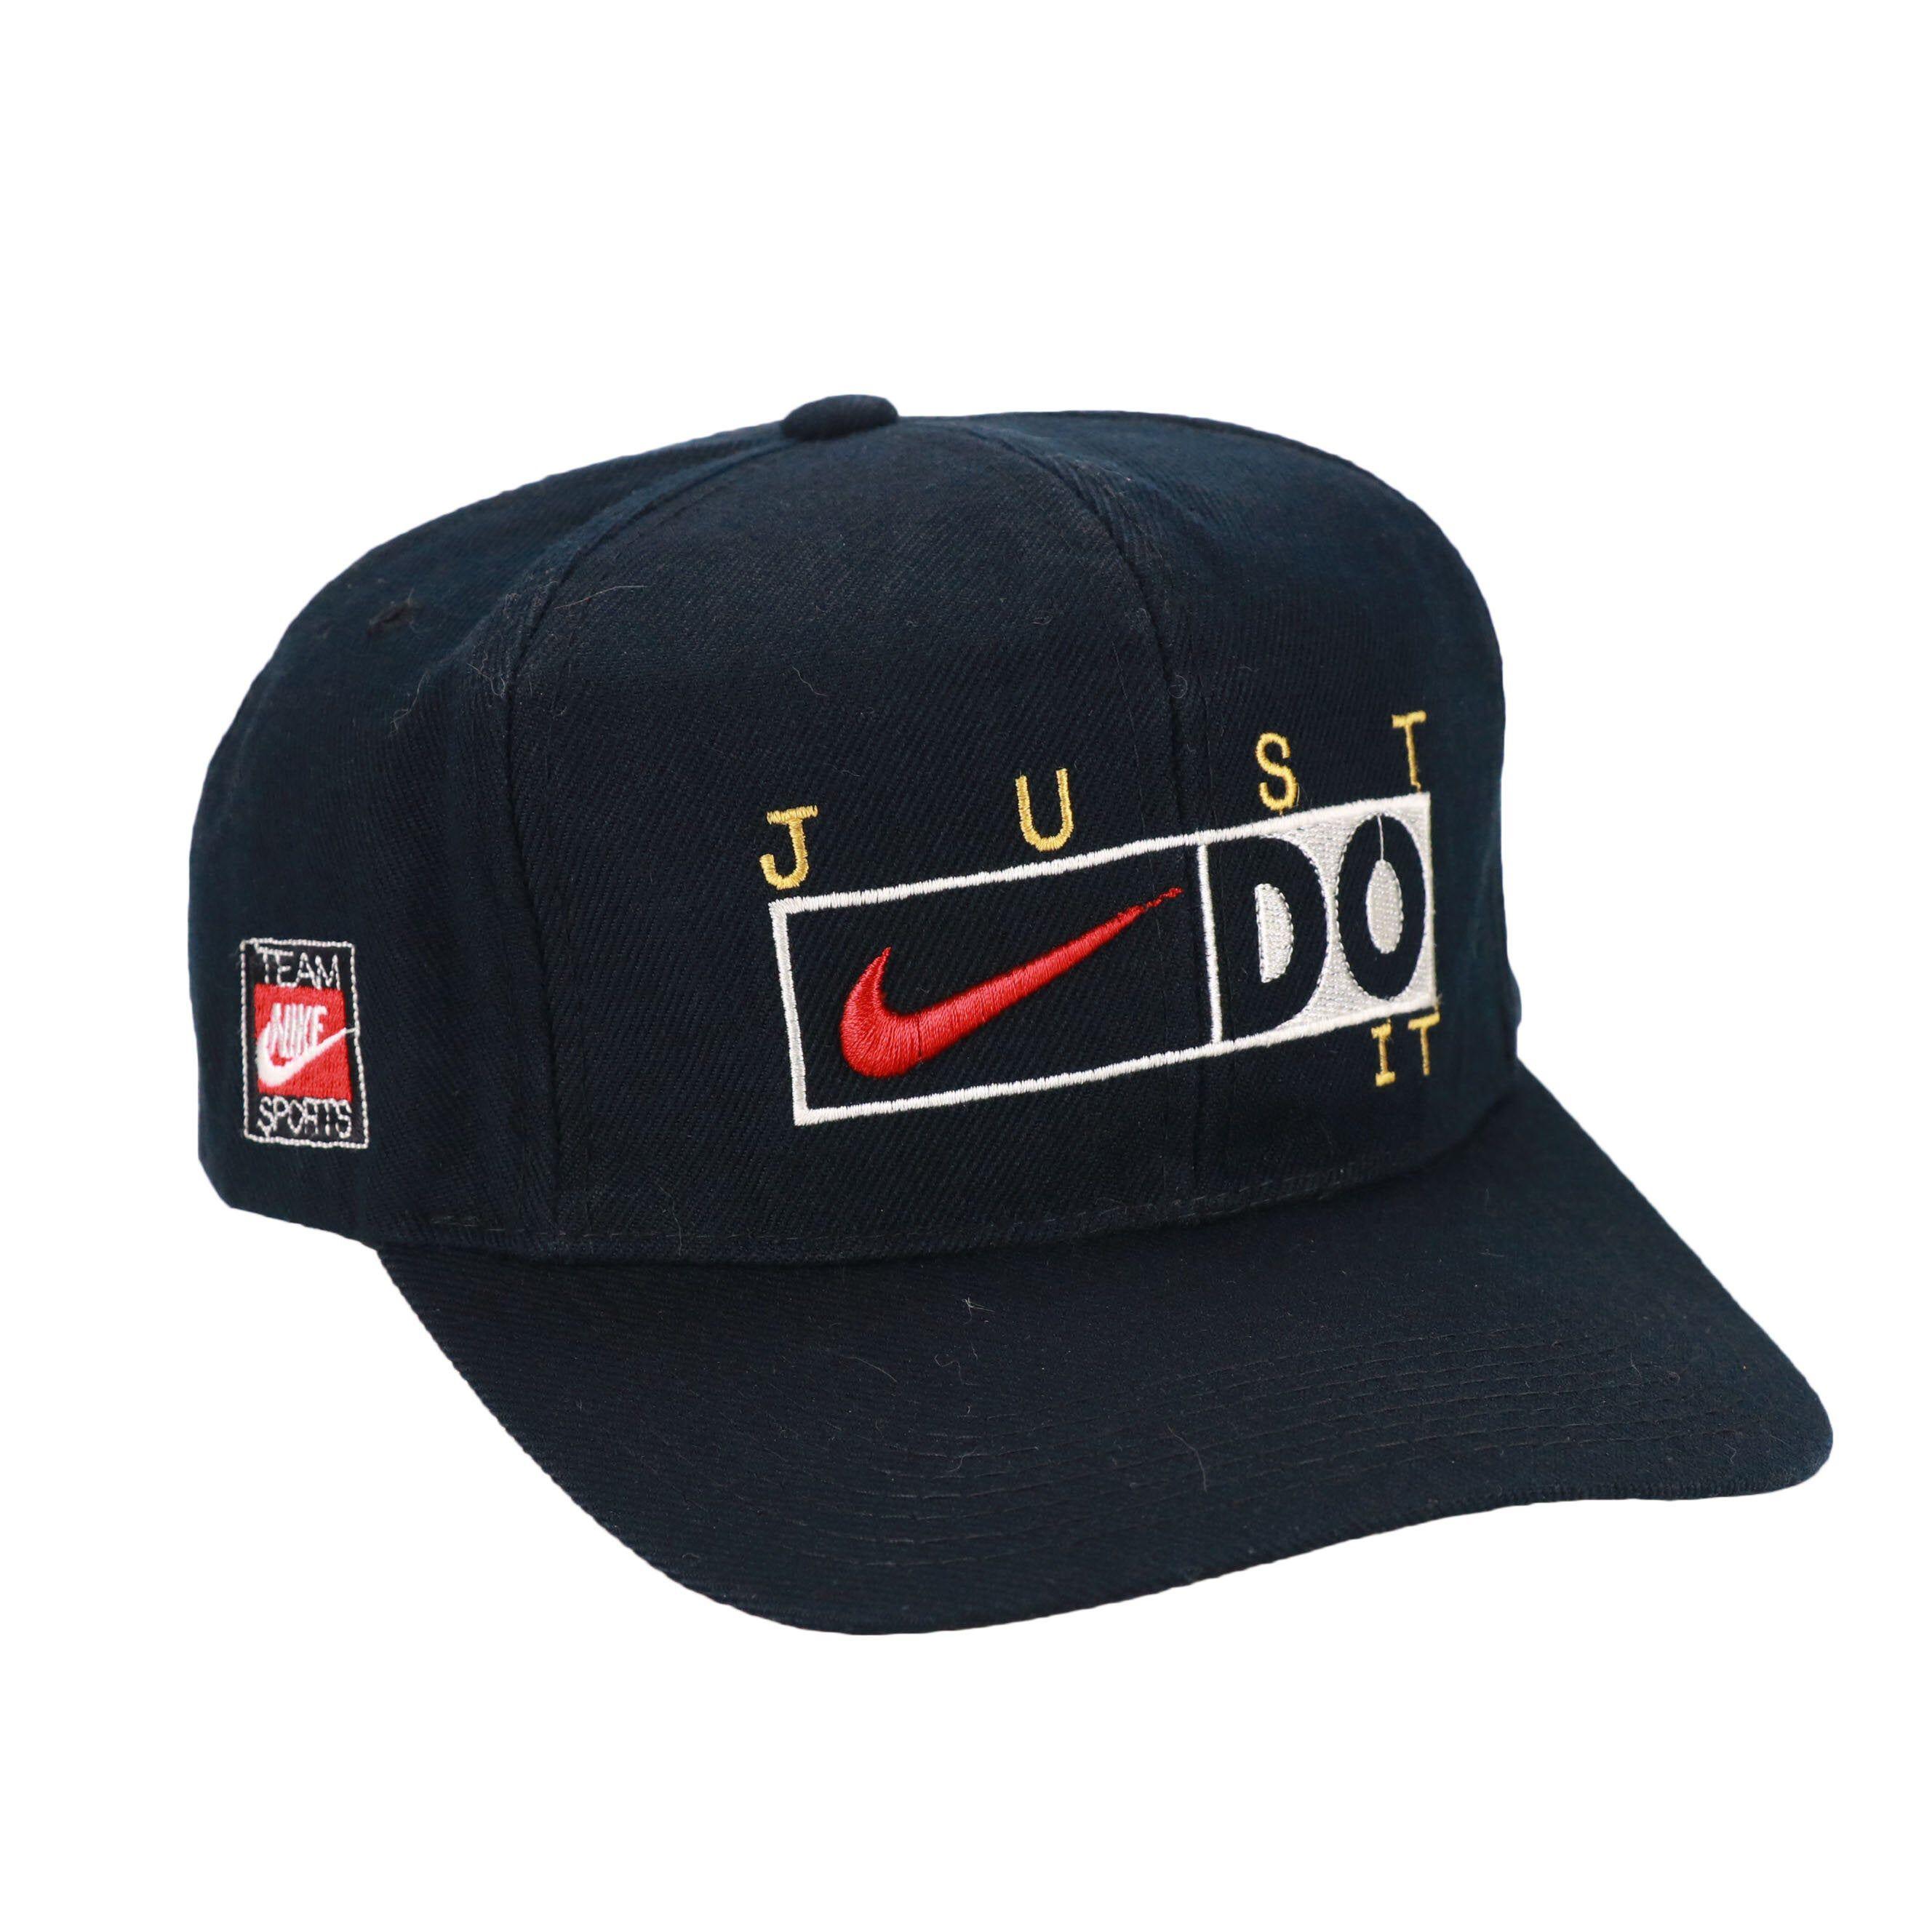 Vintage 90s Nike Big Swoosh Logo Cap Hat Snapback Nike Just Etsy 90s Nike Vintage Nike Nike Cap